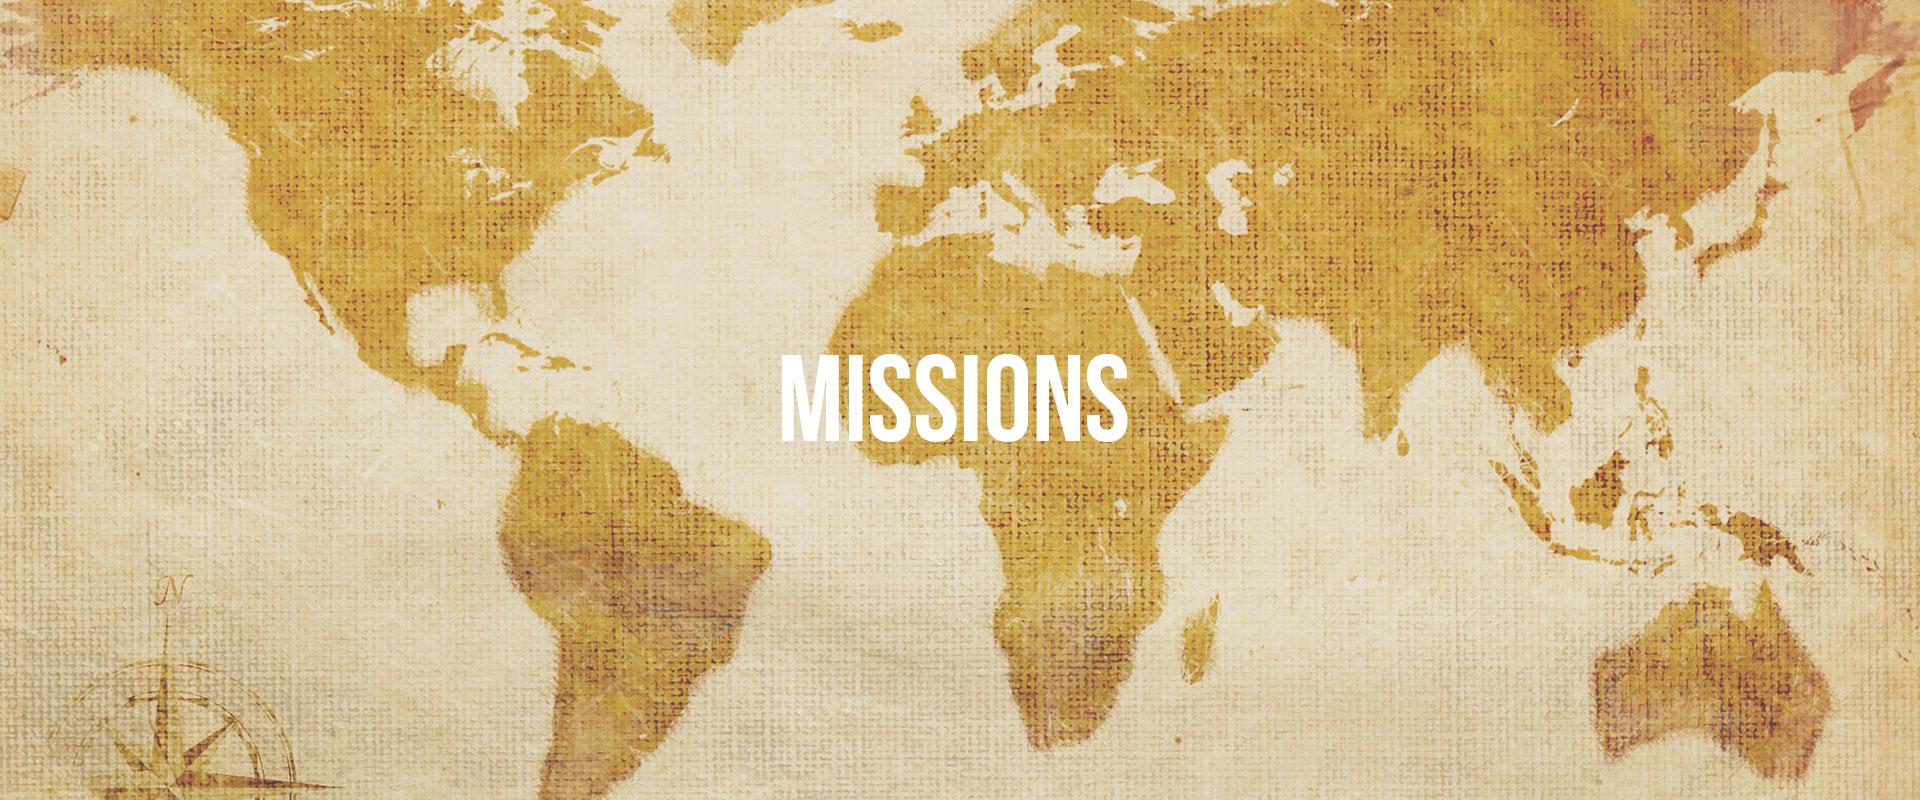 missions-header